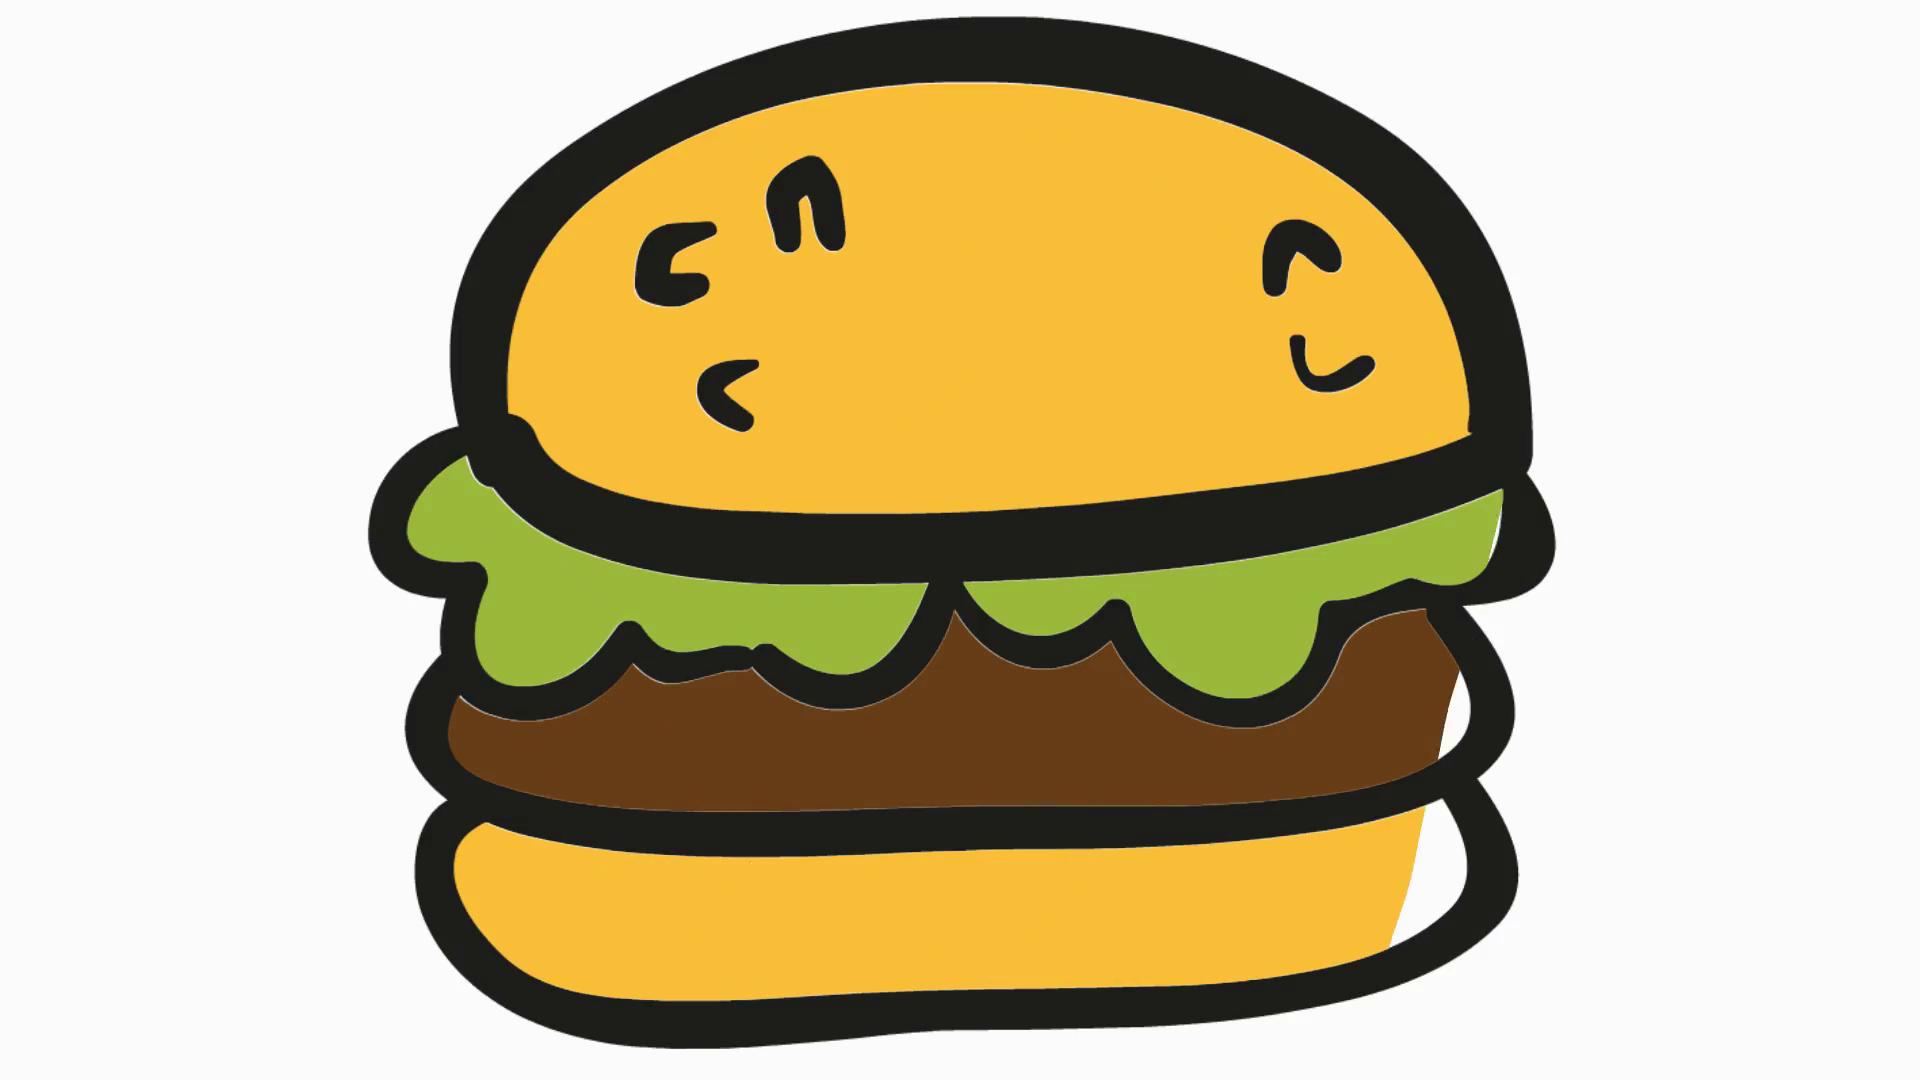 Burger clipart transparent background. Cartoon illustration hand drawn